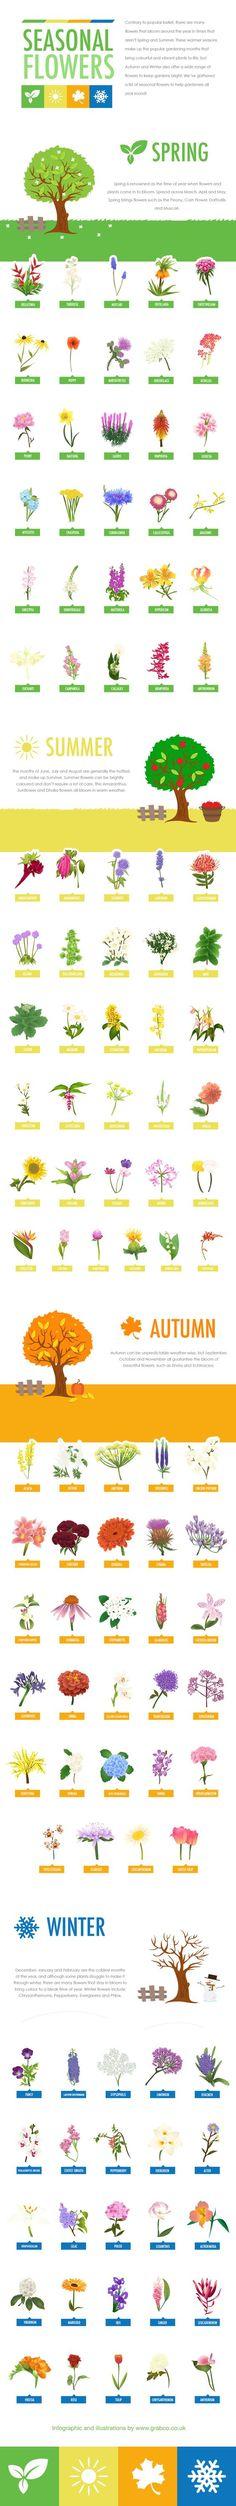 Seasonal Flowers [Hand Drawn Infographic] | ecogreenlove